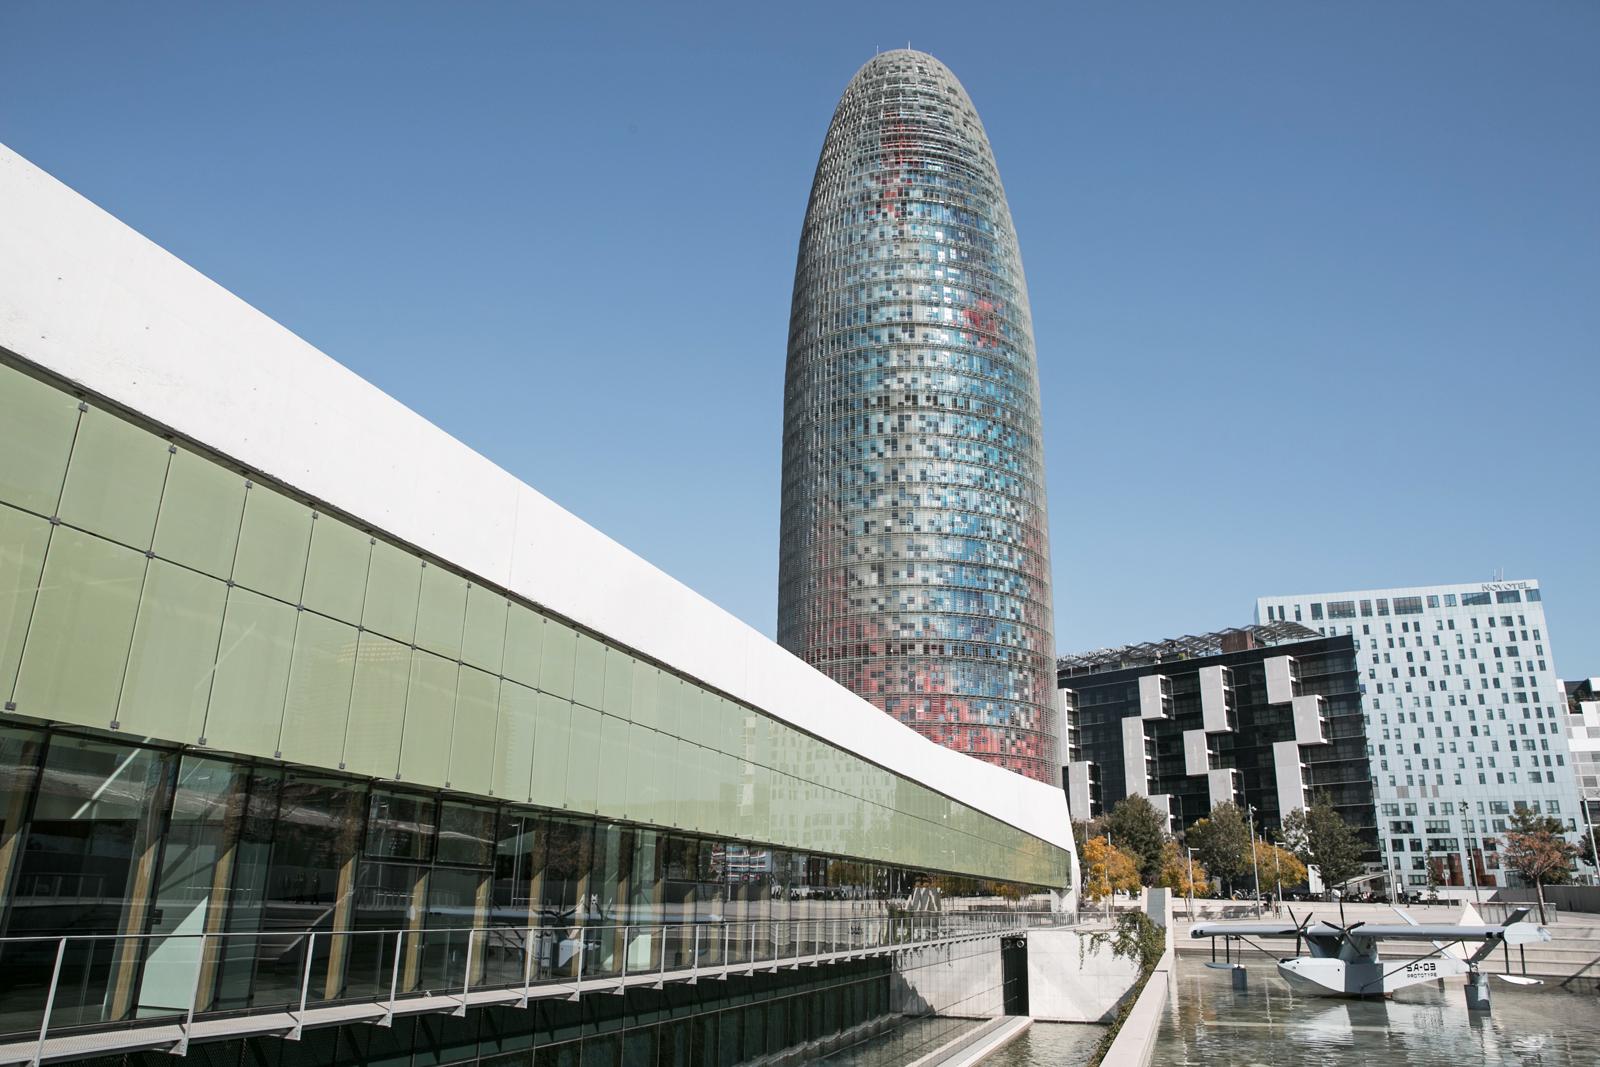 El Museu del Disseny y la torre Agbar